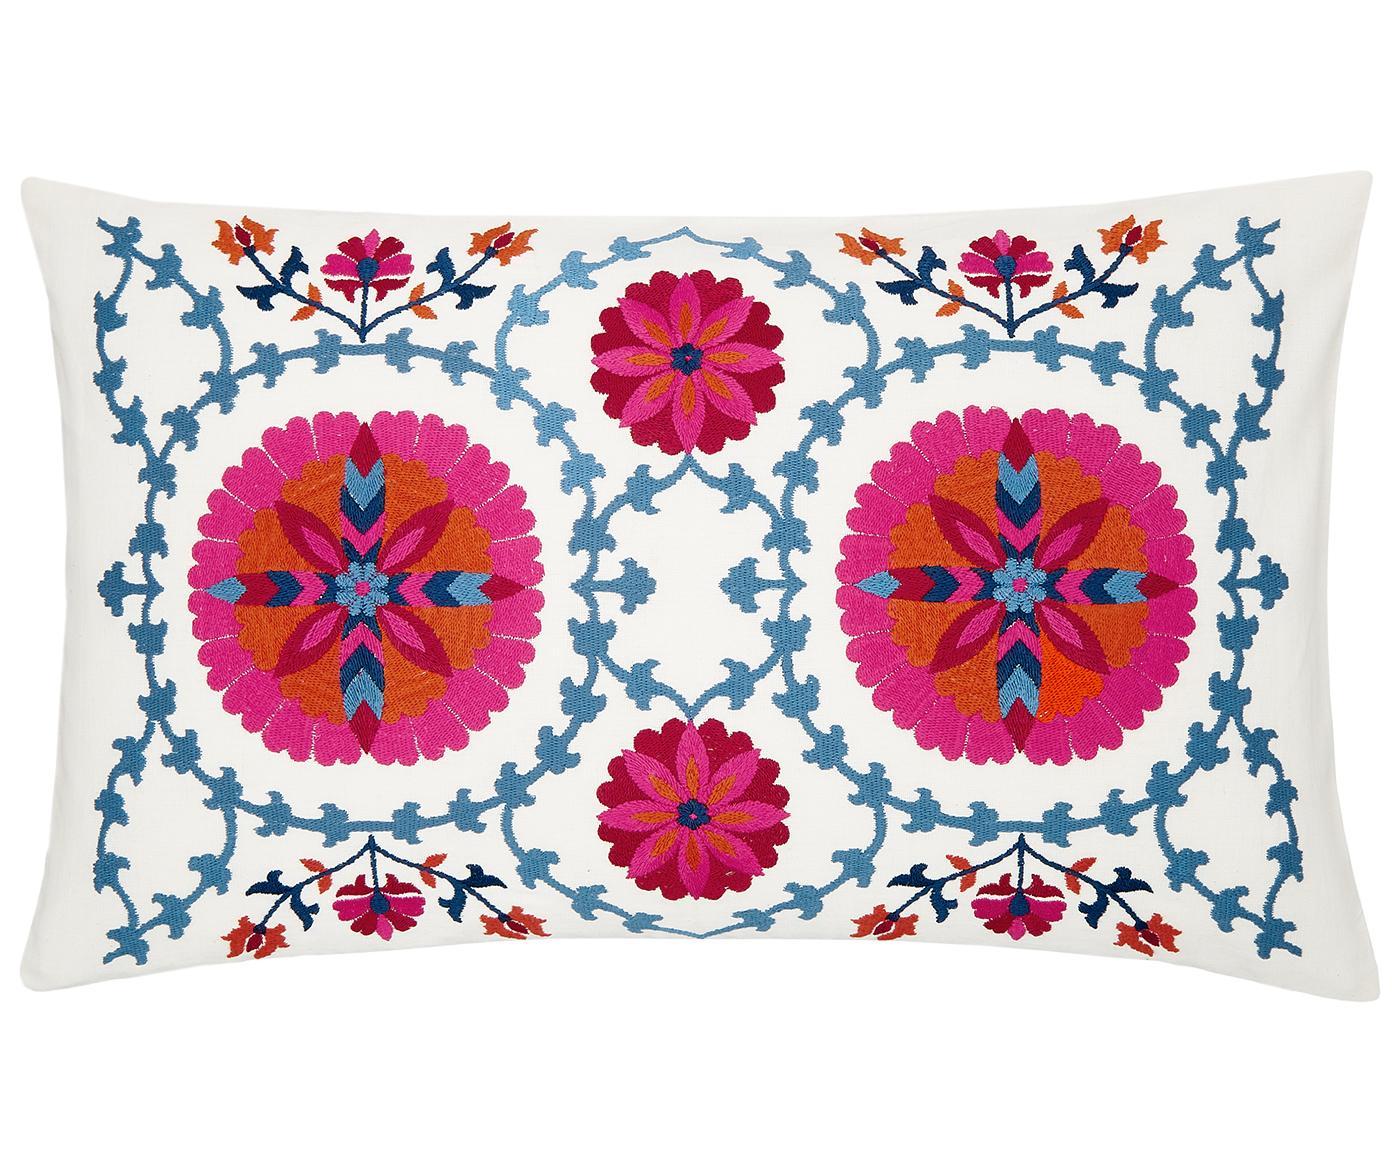 Geborduurde  kussenhoes Tabula, Katoen, Crèmewit, multicolour, 30 x 50 cm